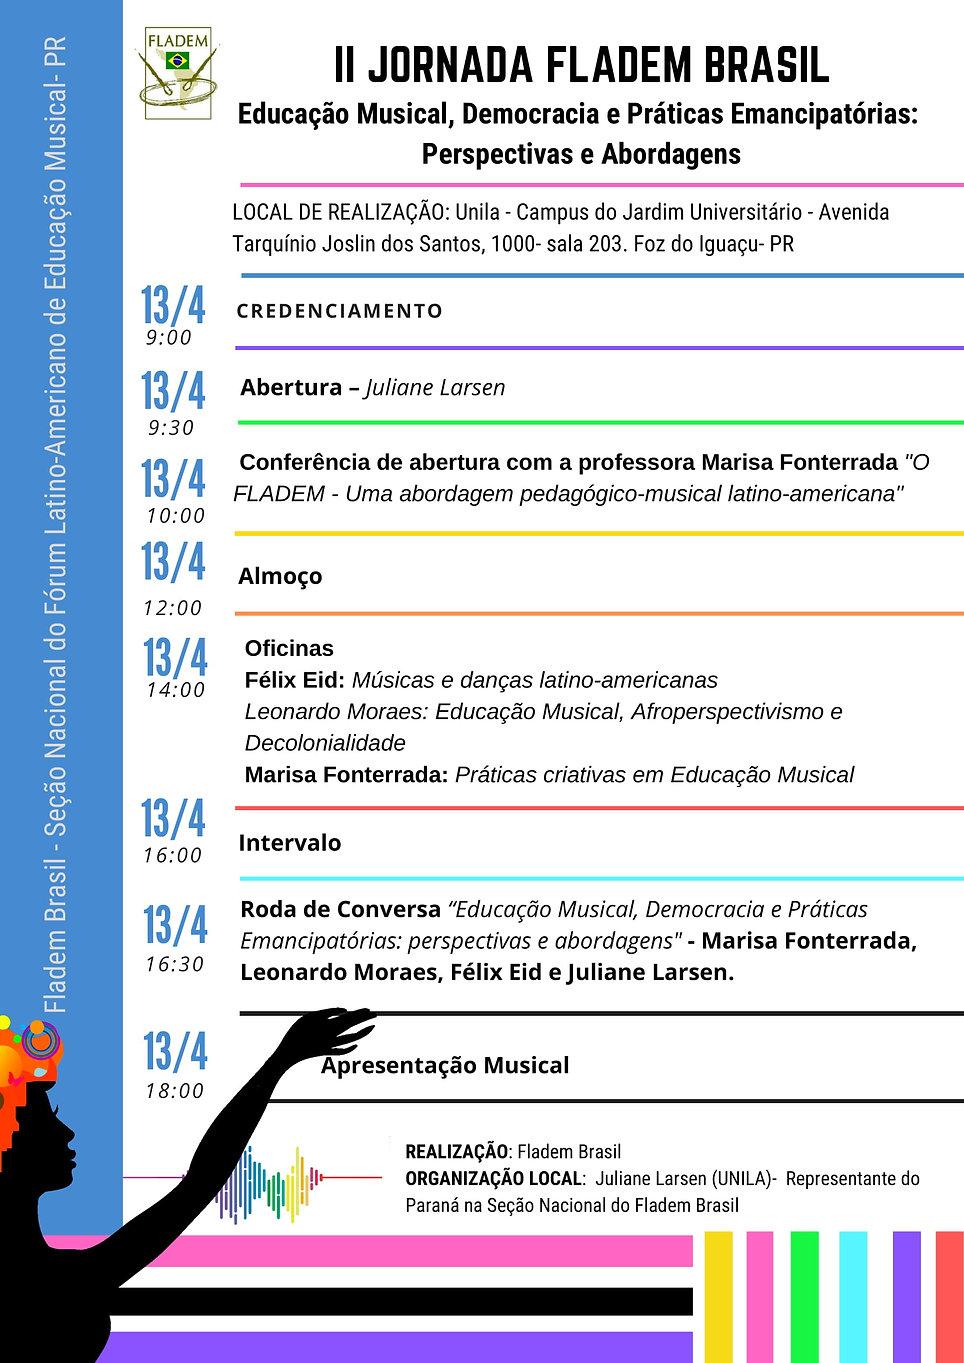 FOZ_DO_IGUAÇU_-_PR_-_Jornada_2019-1.jpg